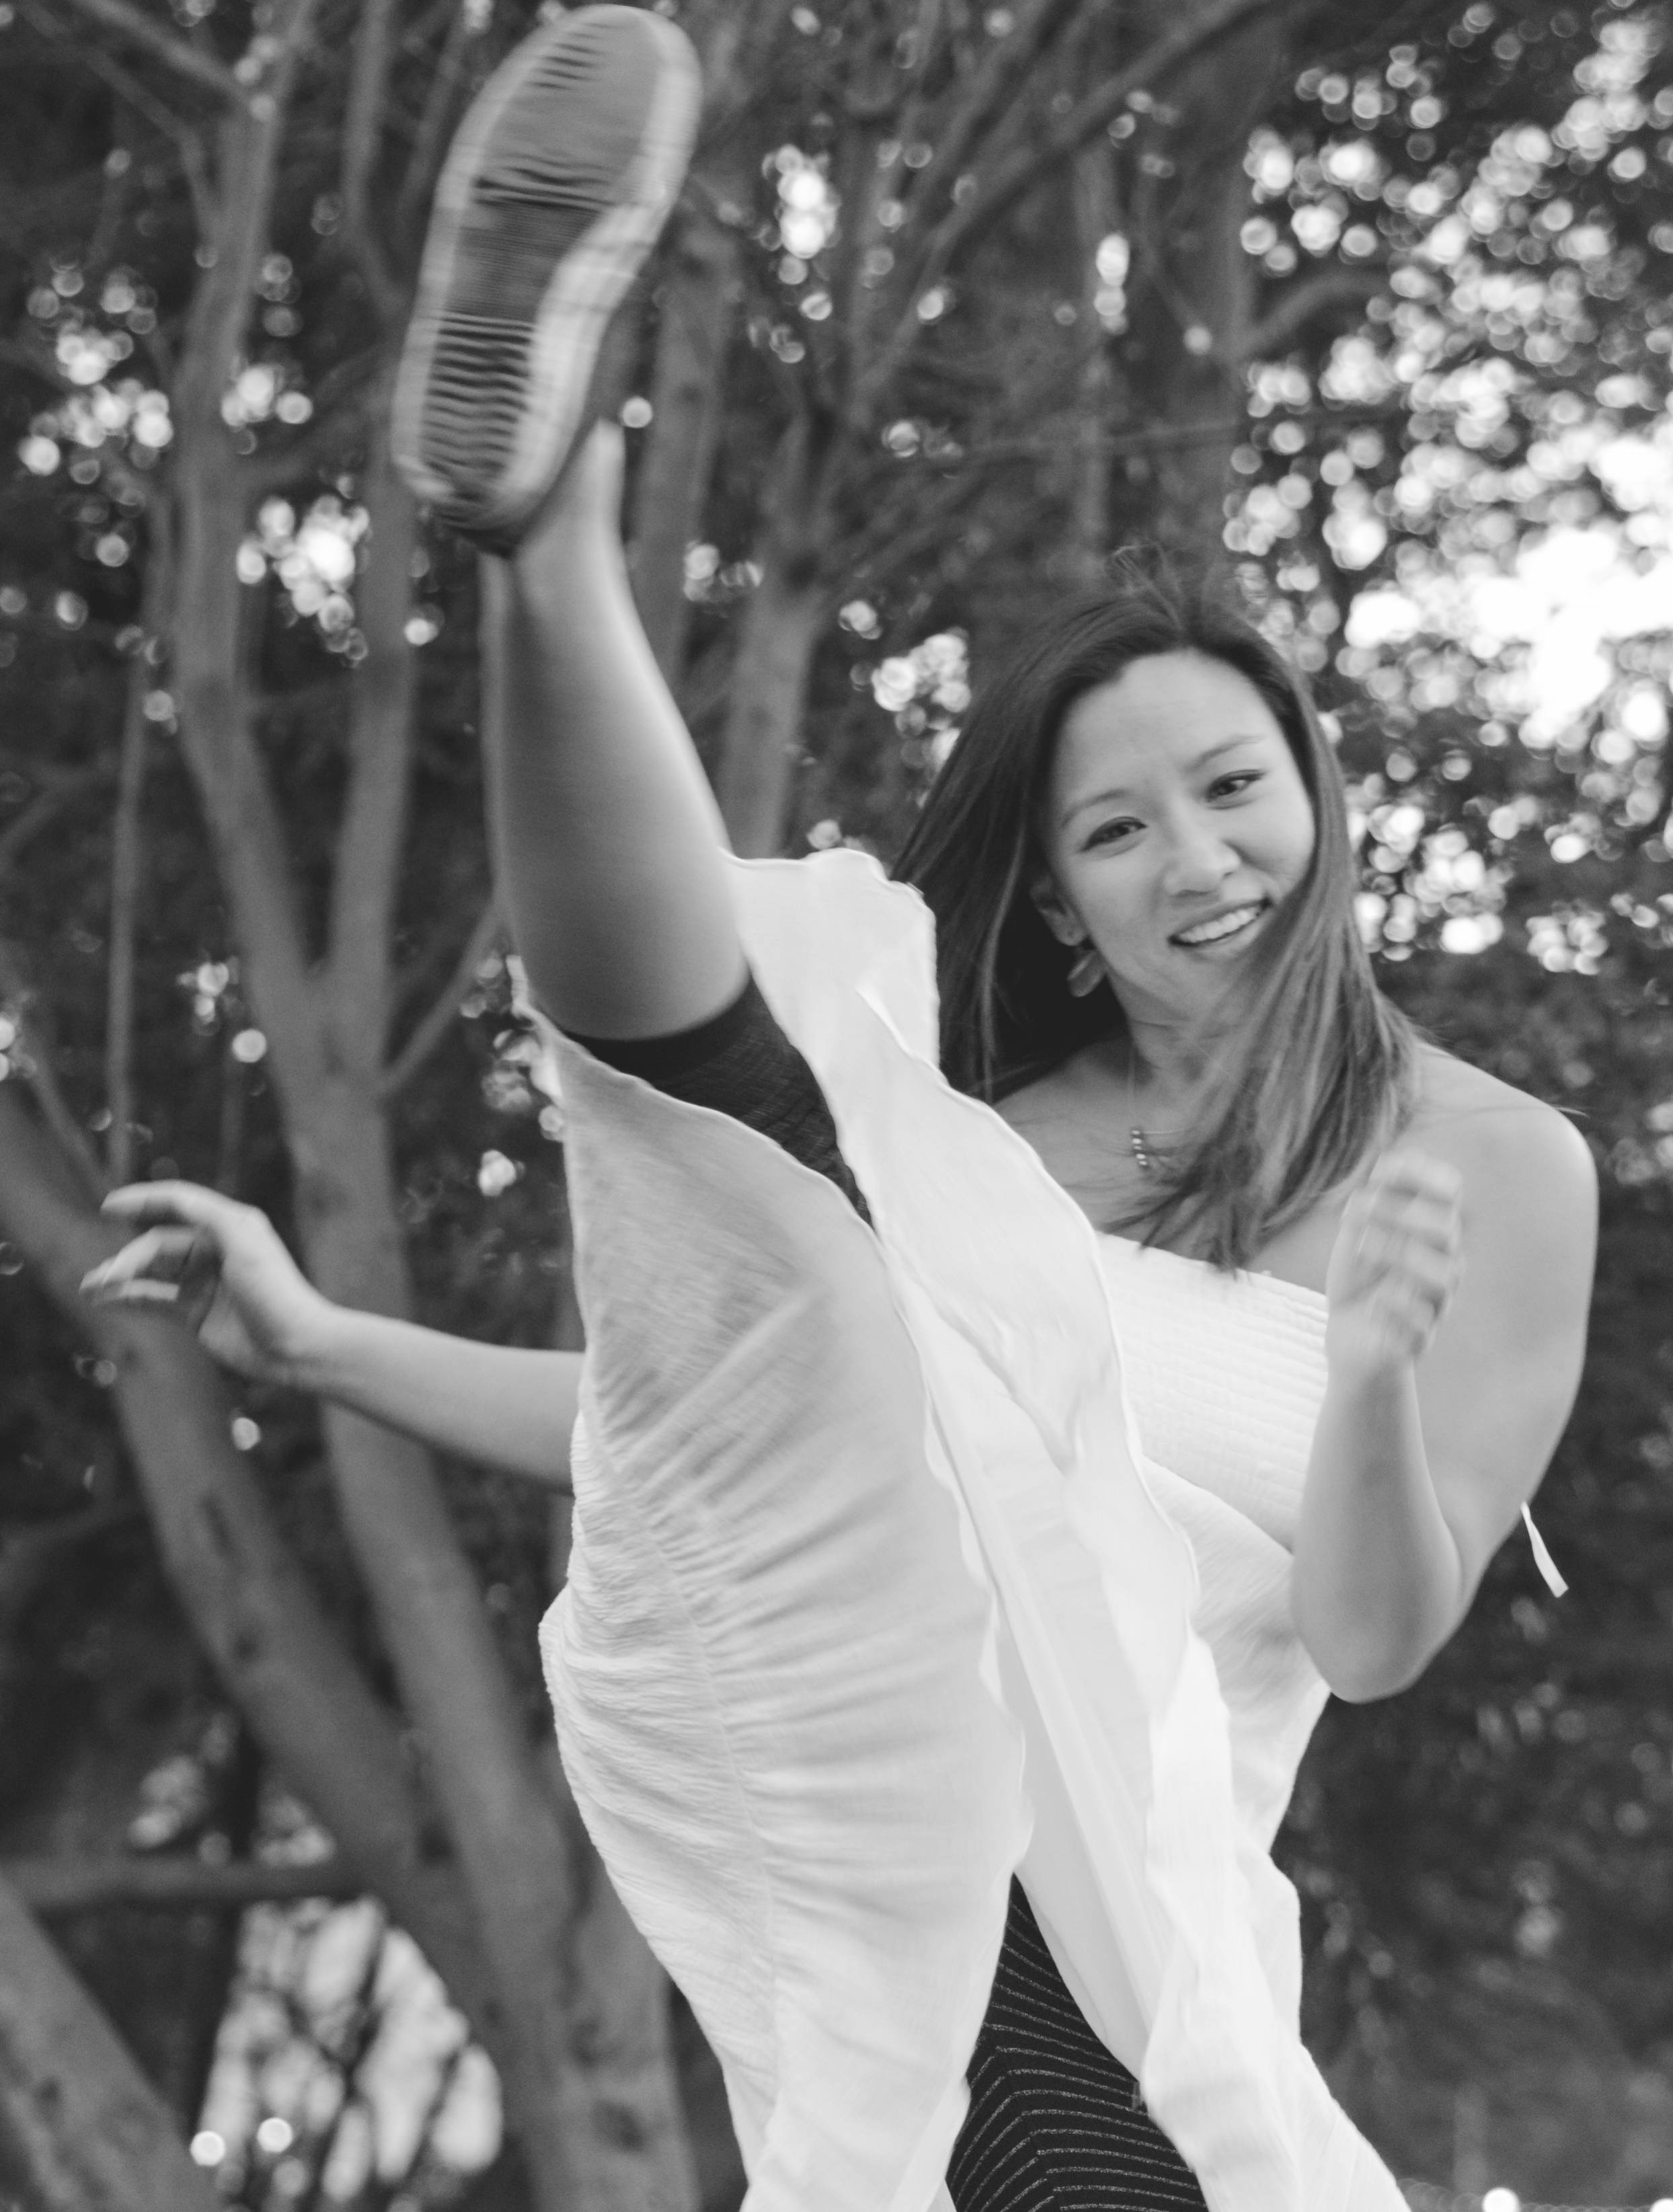 White Dress Photoshoot at Lake Merritt, Oakland by Cybil A. Fresnido-Patz